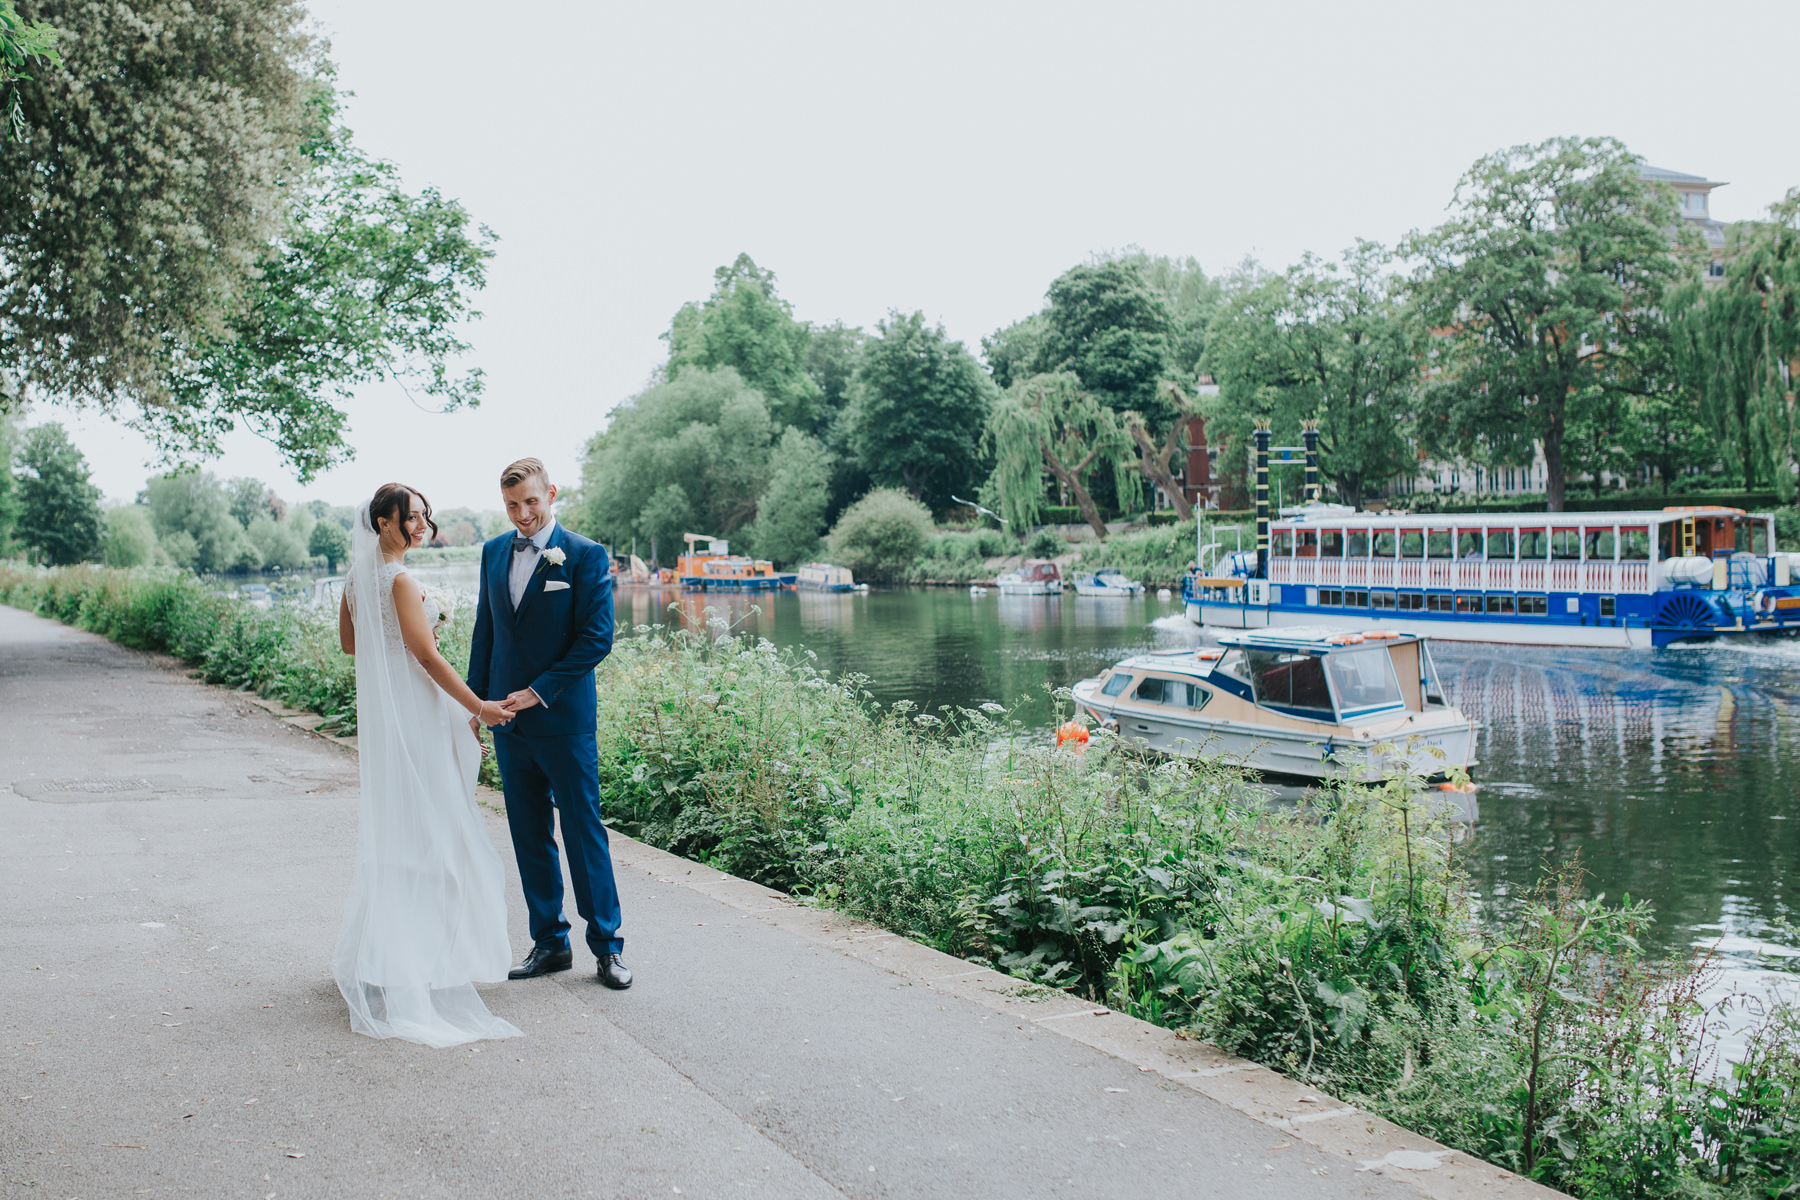 CRL-359-The Bingham wedding Richmond-Claire Rob bridal couple portraits on Thamespath.jpg